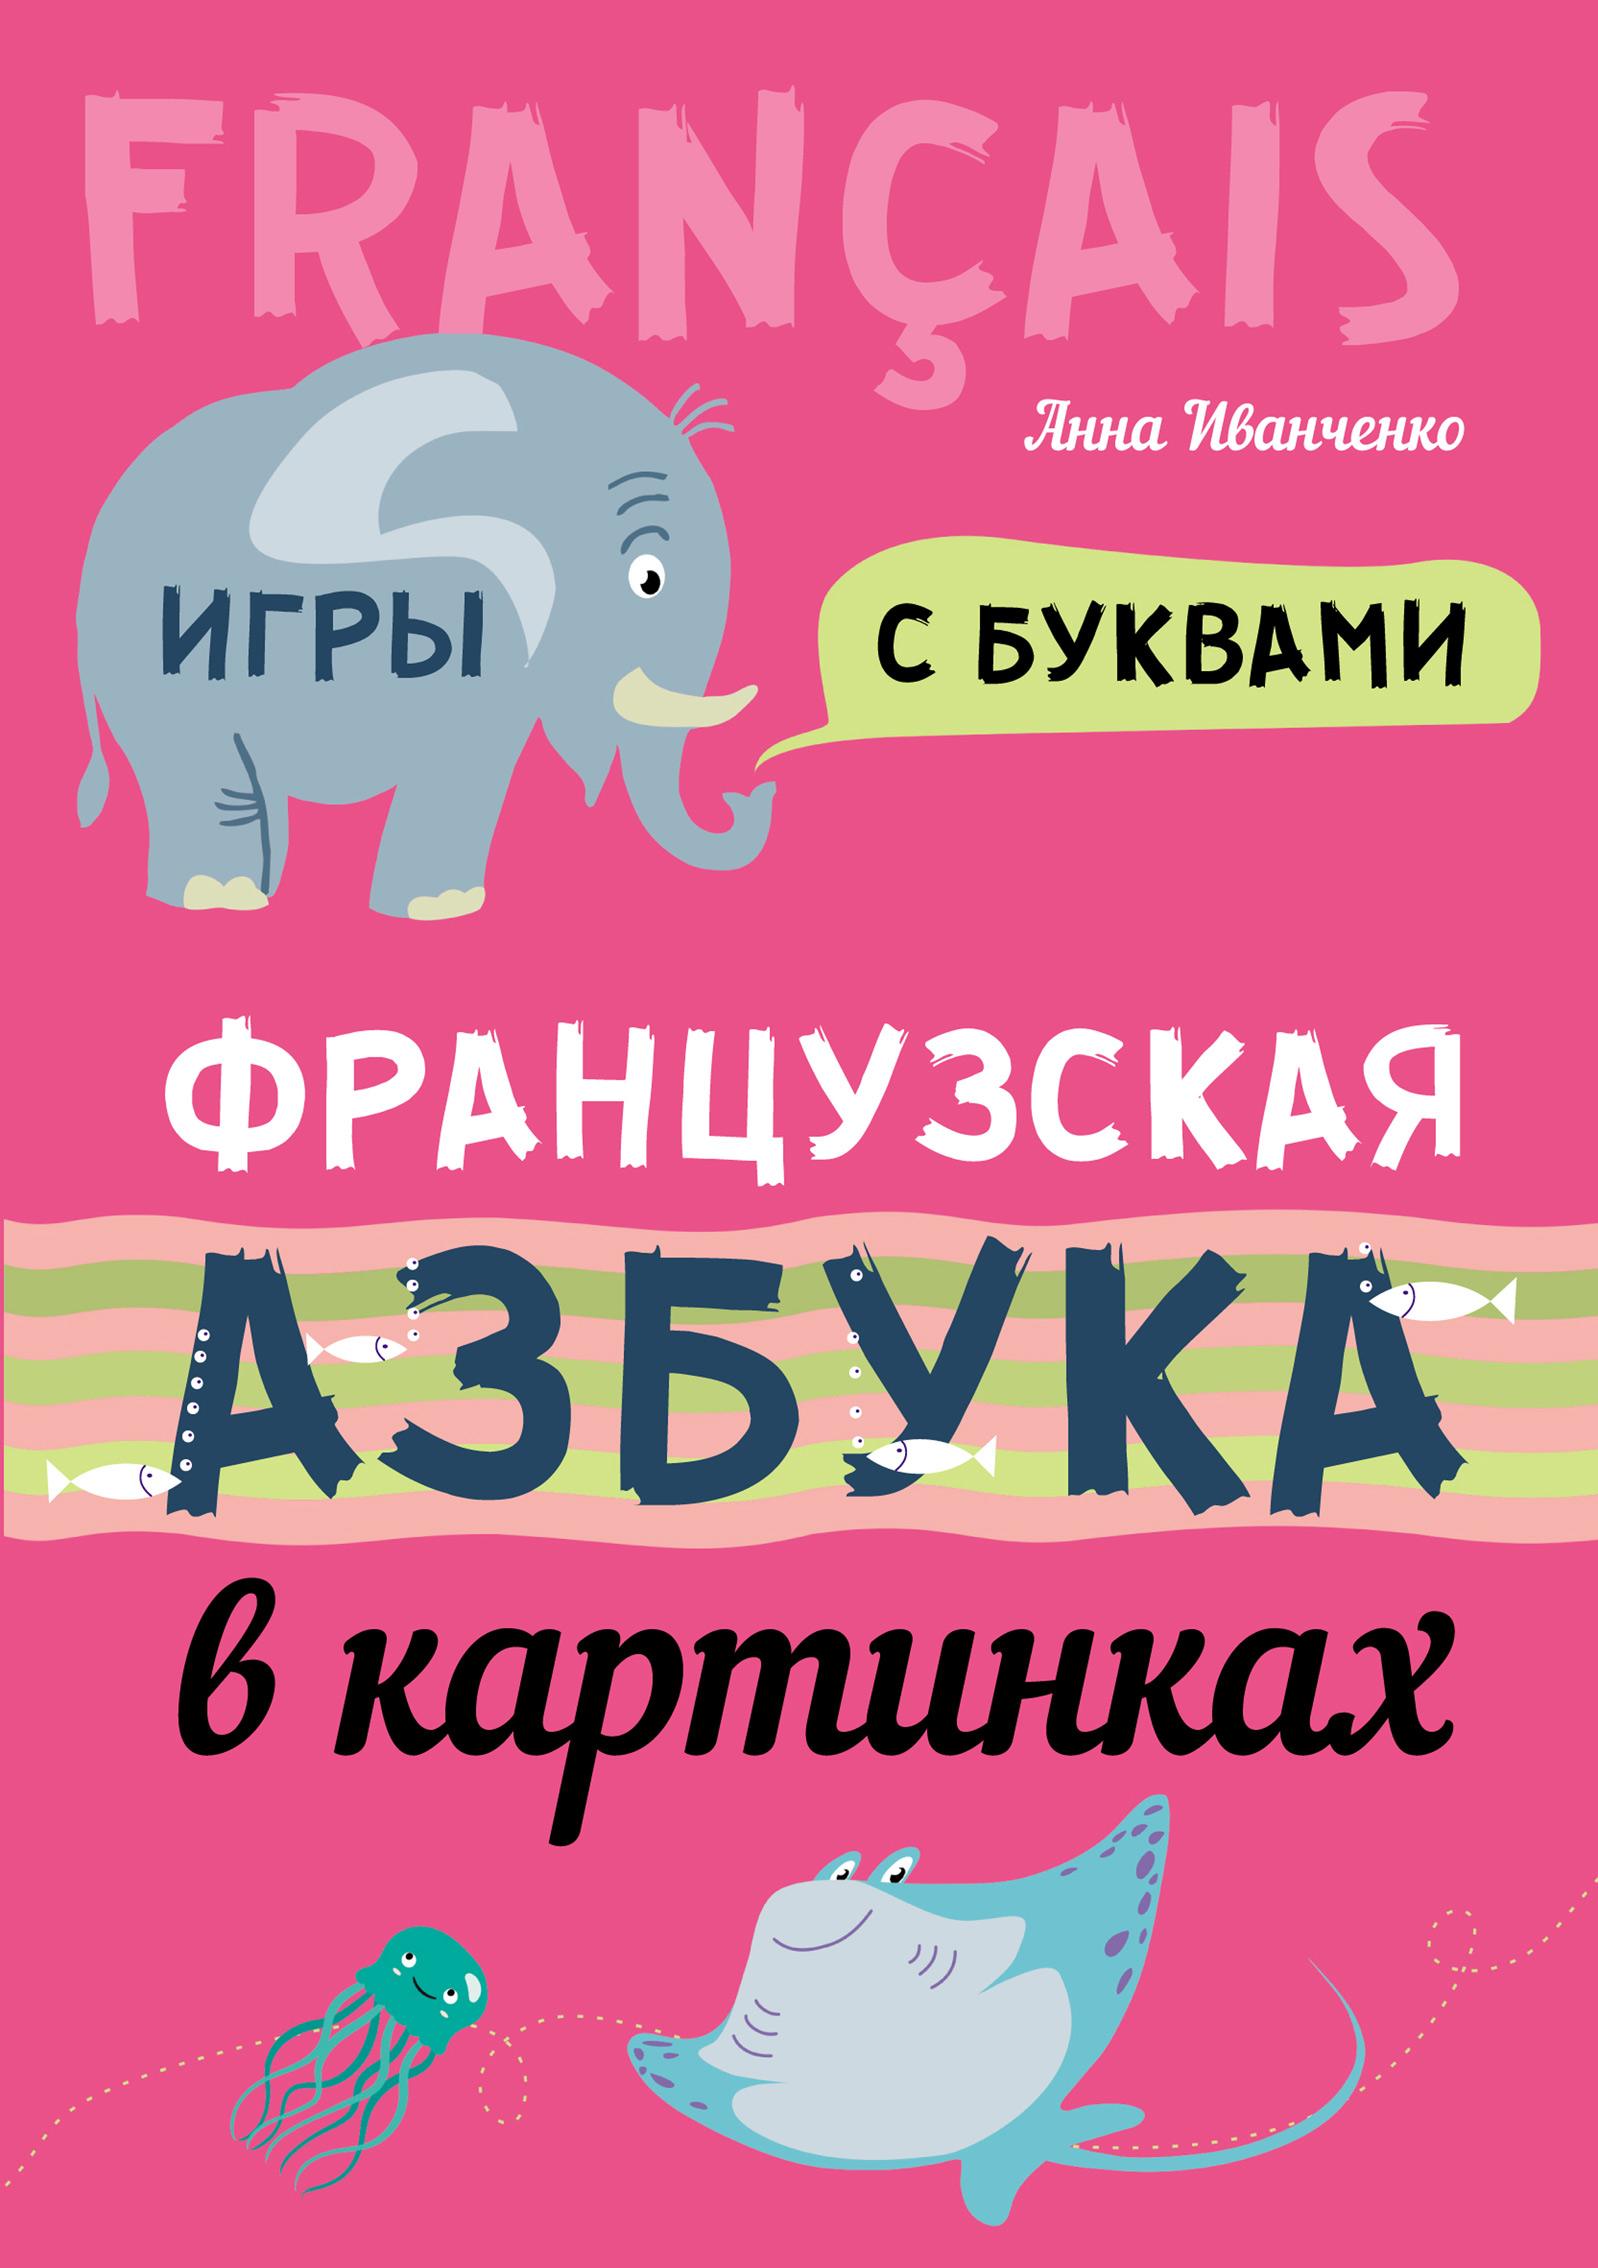 а с суэтин французская защита А. И. Иванченко Французская азбука в картинках